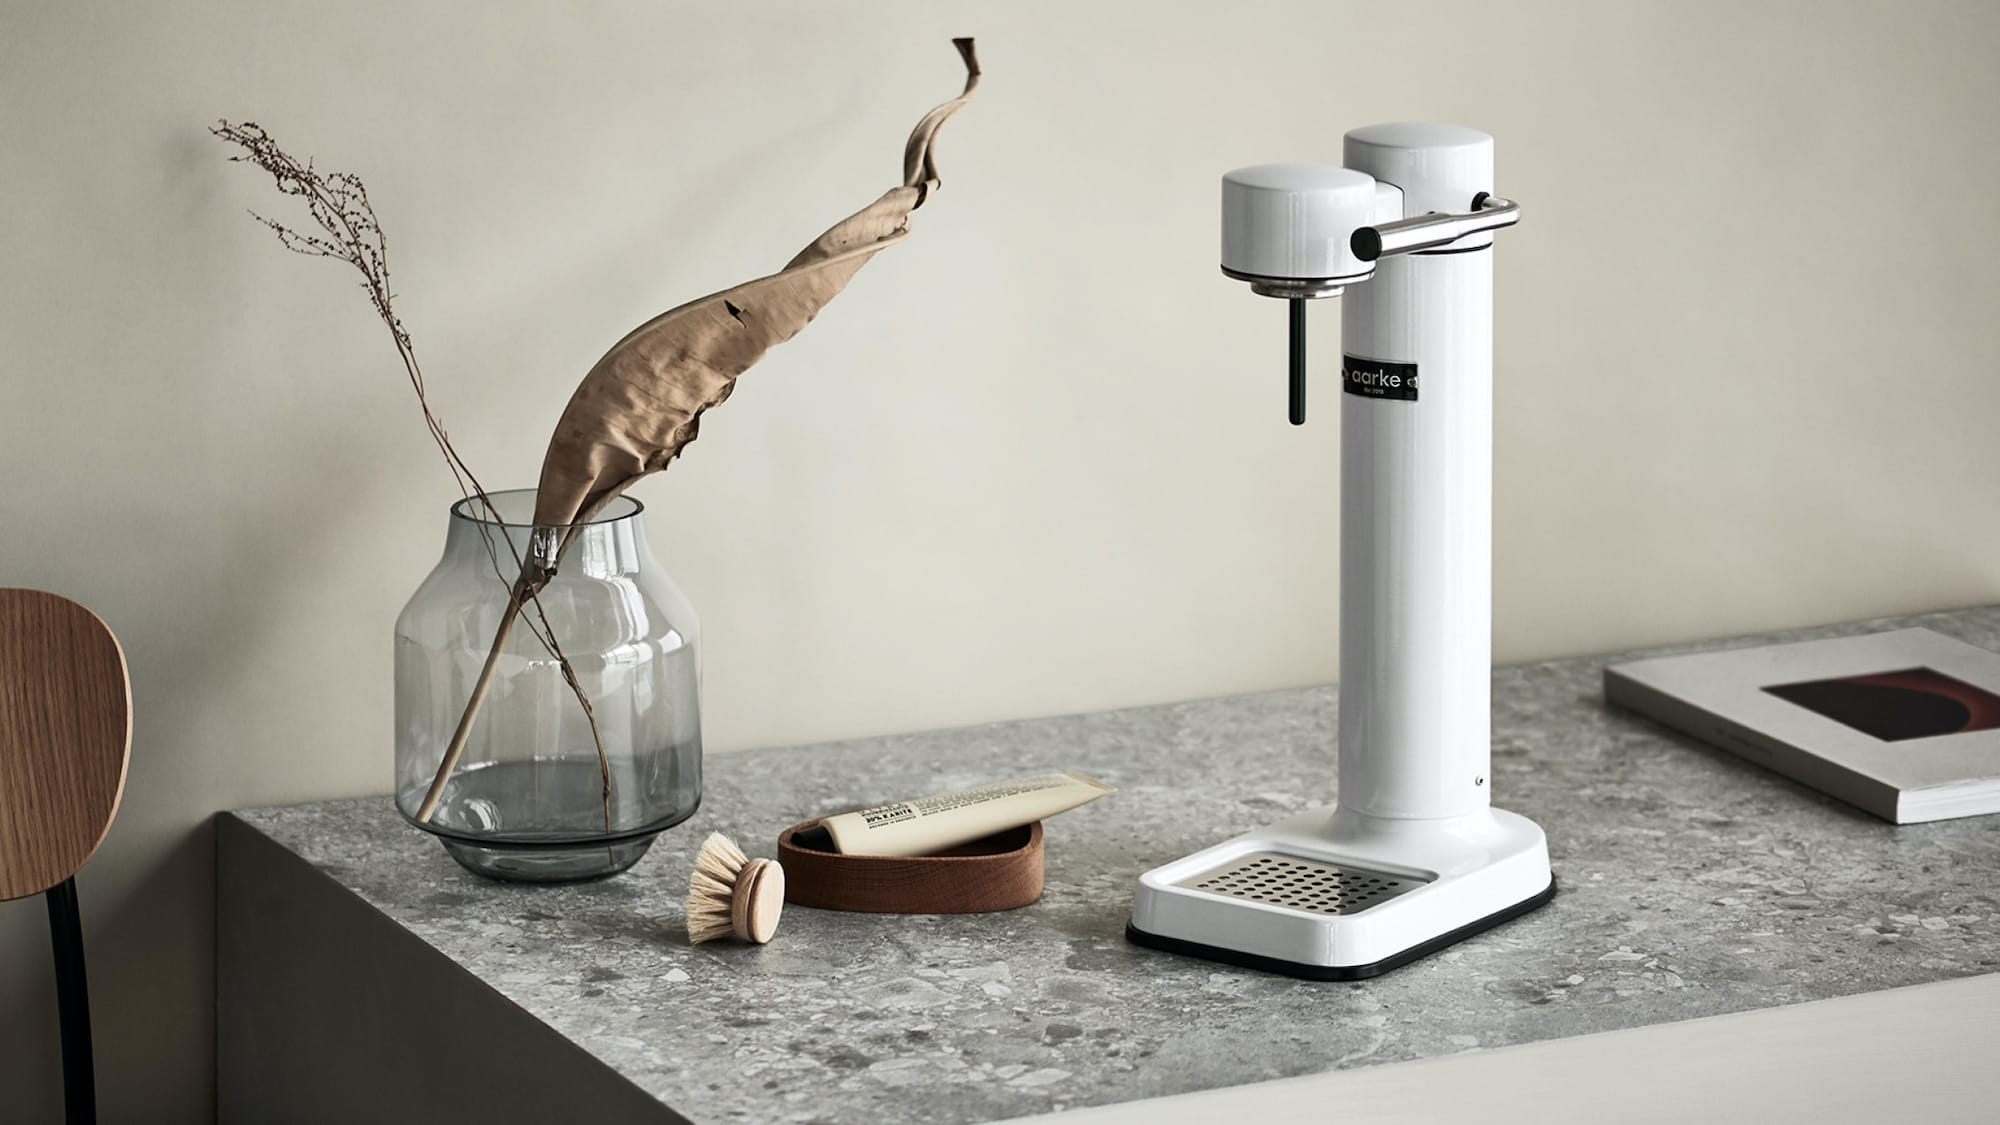 Aarke Carbonator II home sparkling water machine consists of premium materials